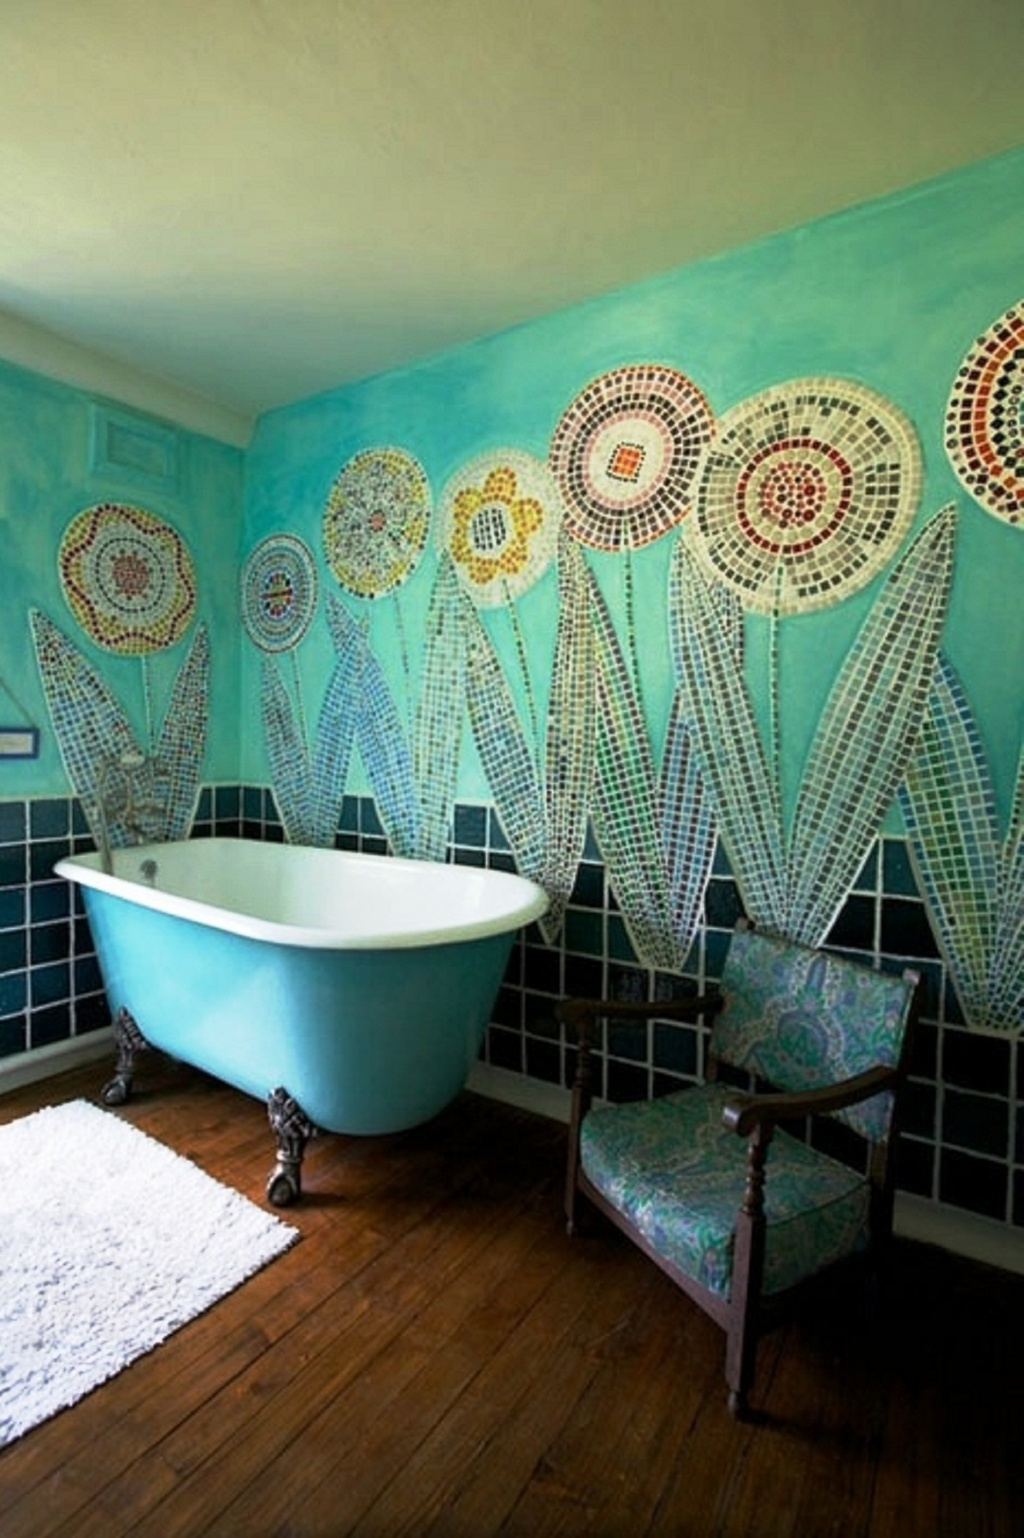 Excellent turquoise bathroom